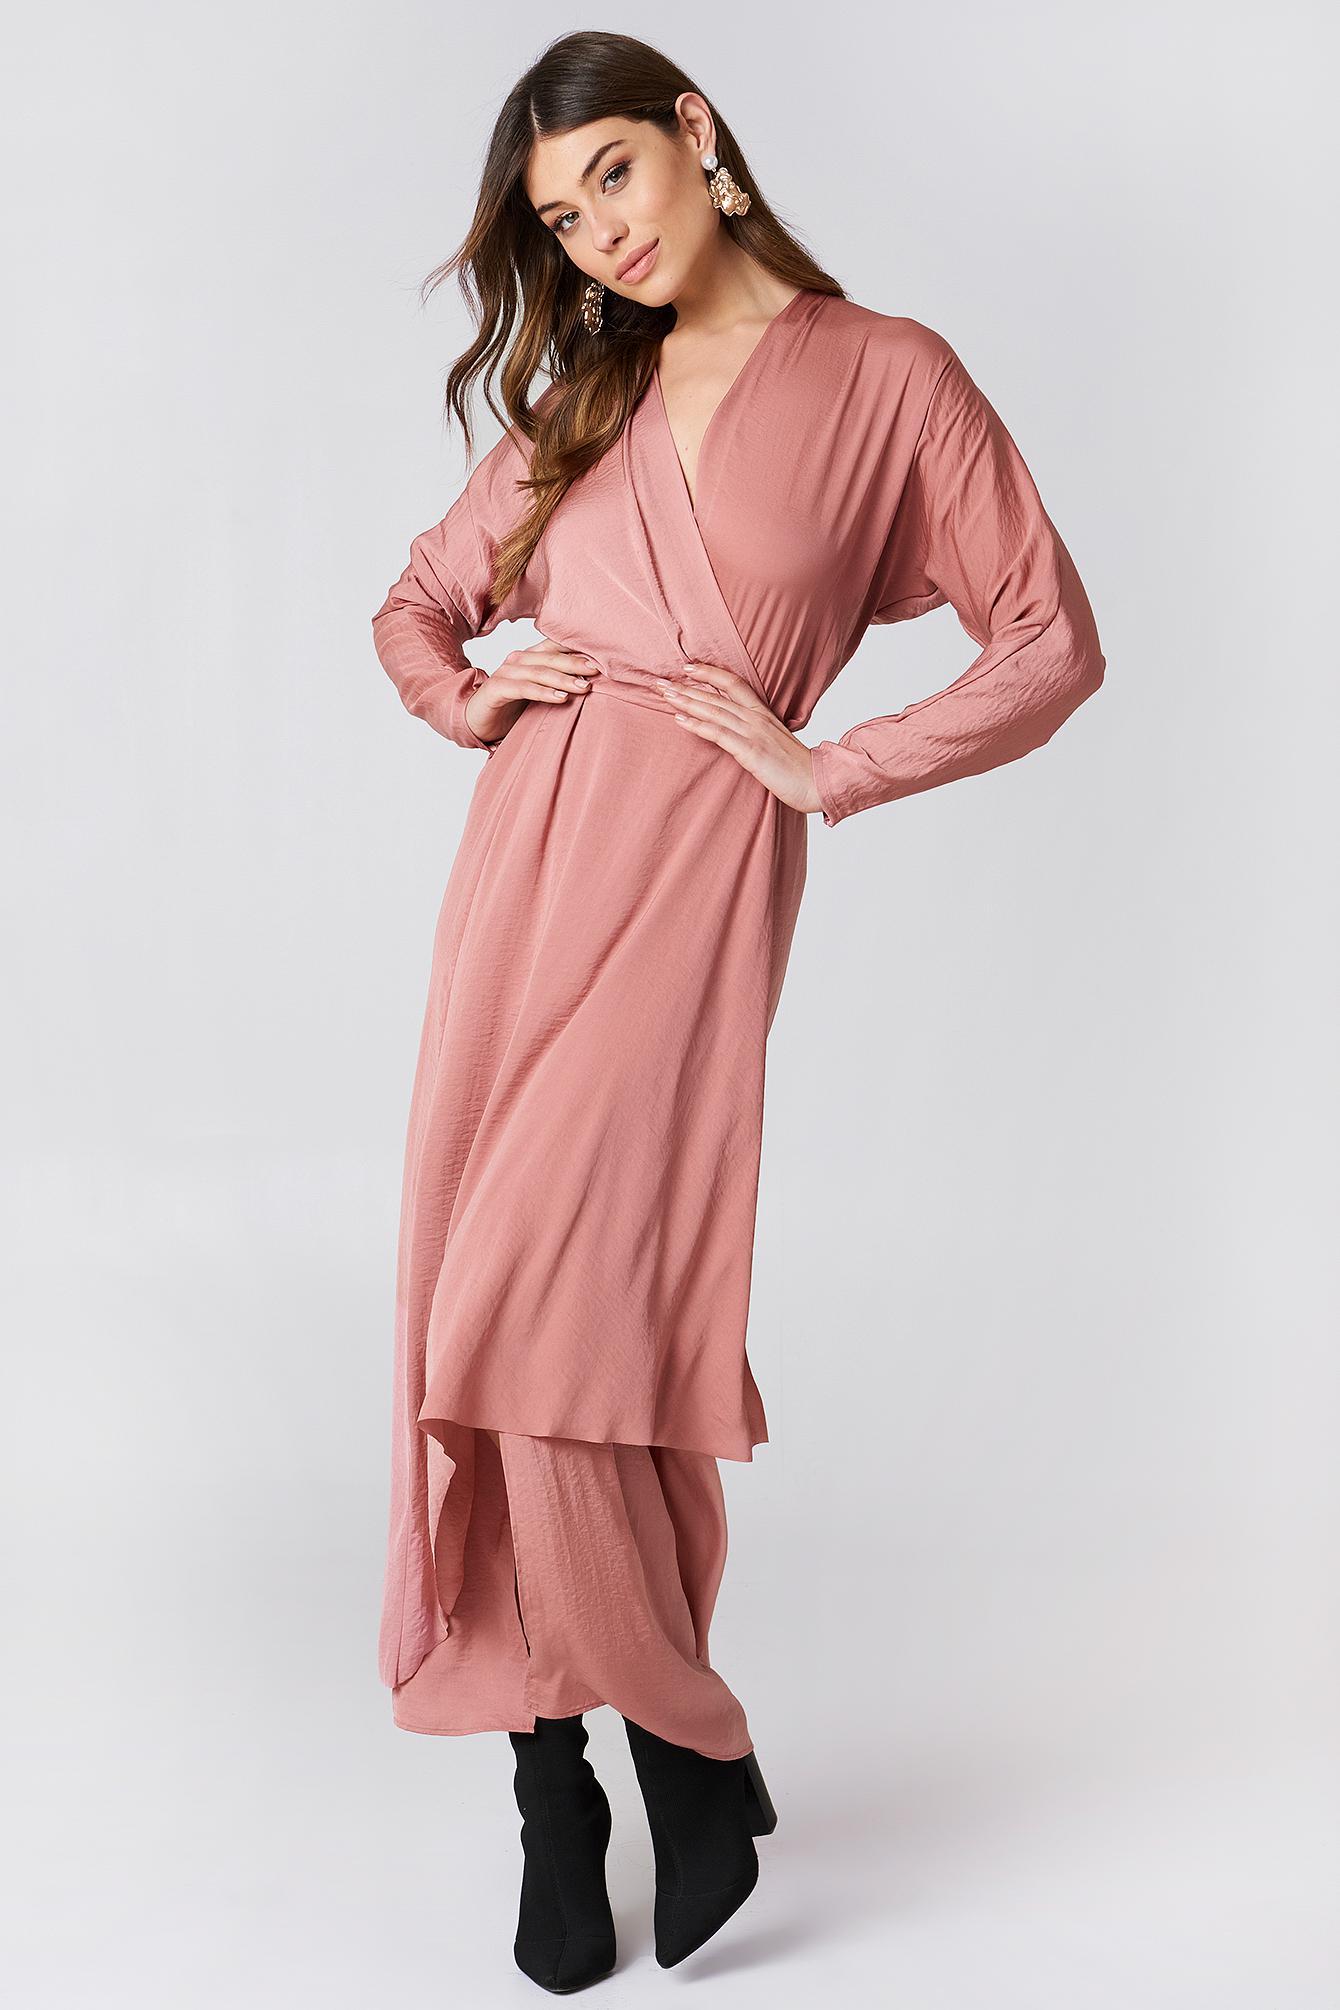 Lyst - Filippa K Drapey Wrap Dress in Pink cc58d26aa346